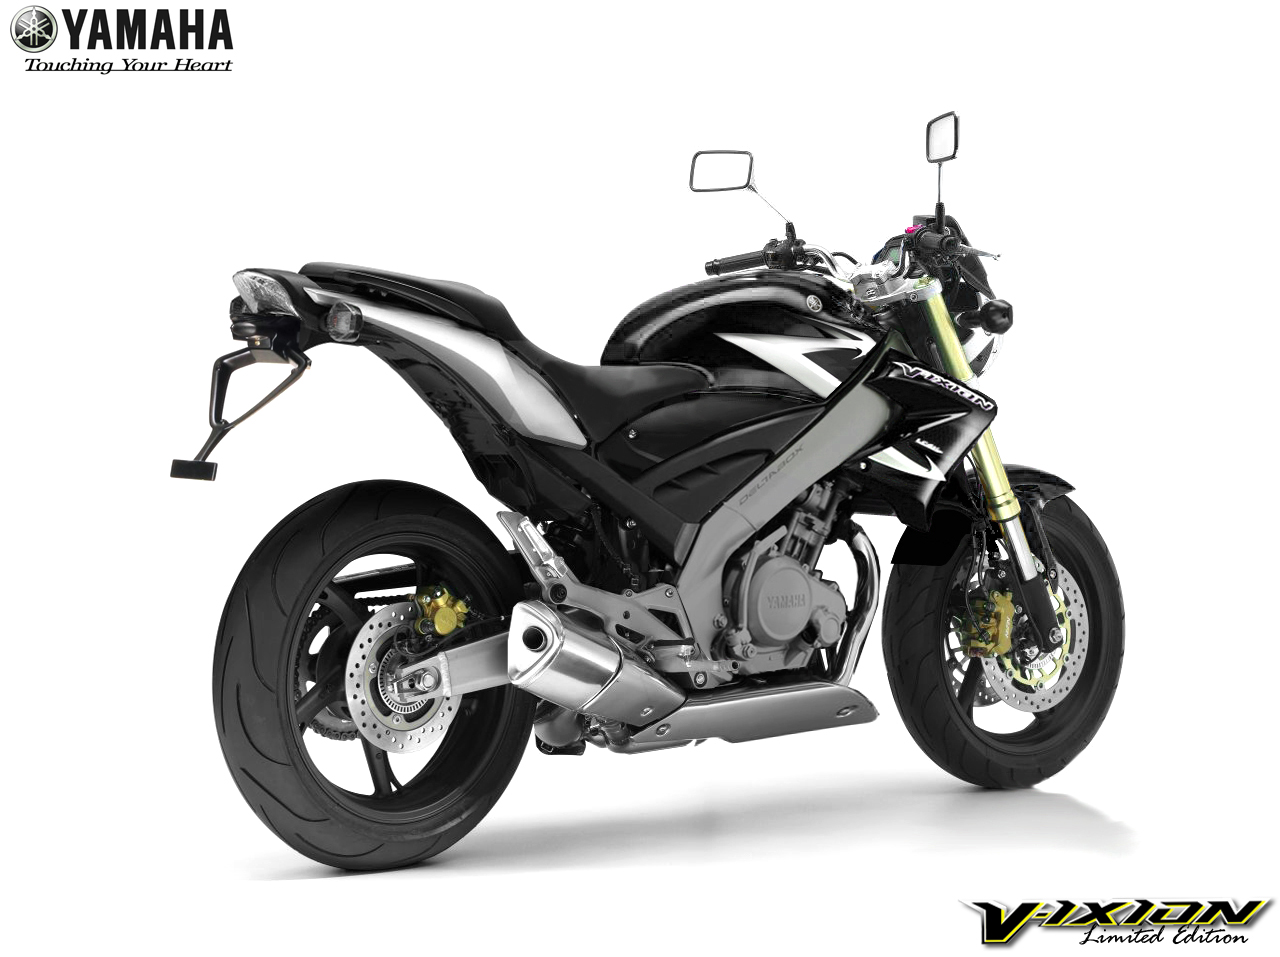 Gambar Motor Yamaha Vixion Modifikasi Modifikasi Motor Terbaru